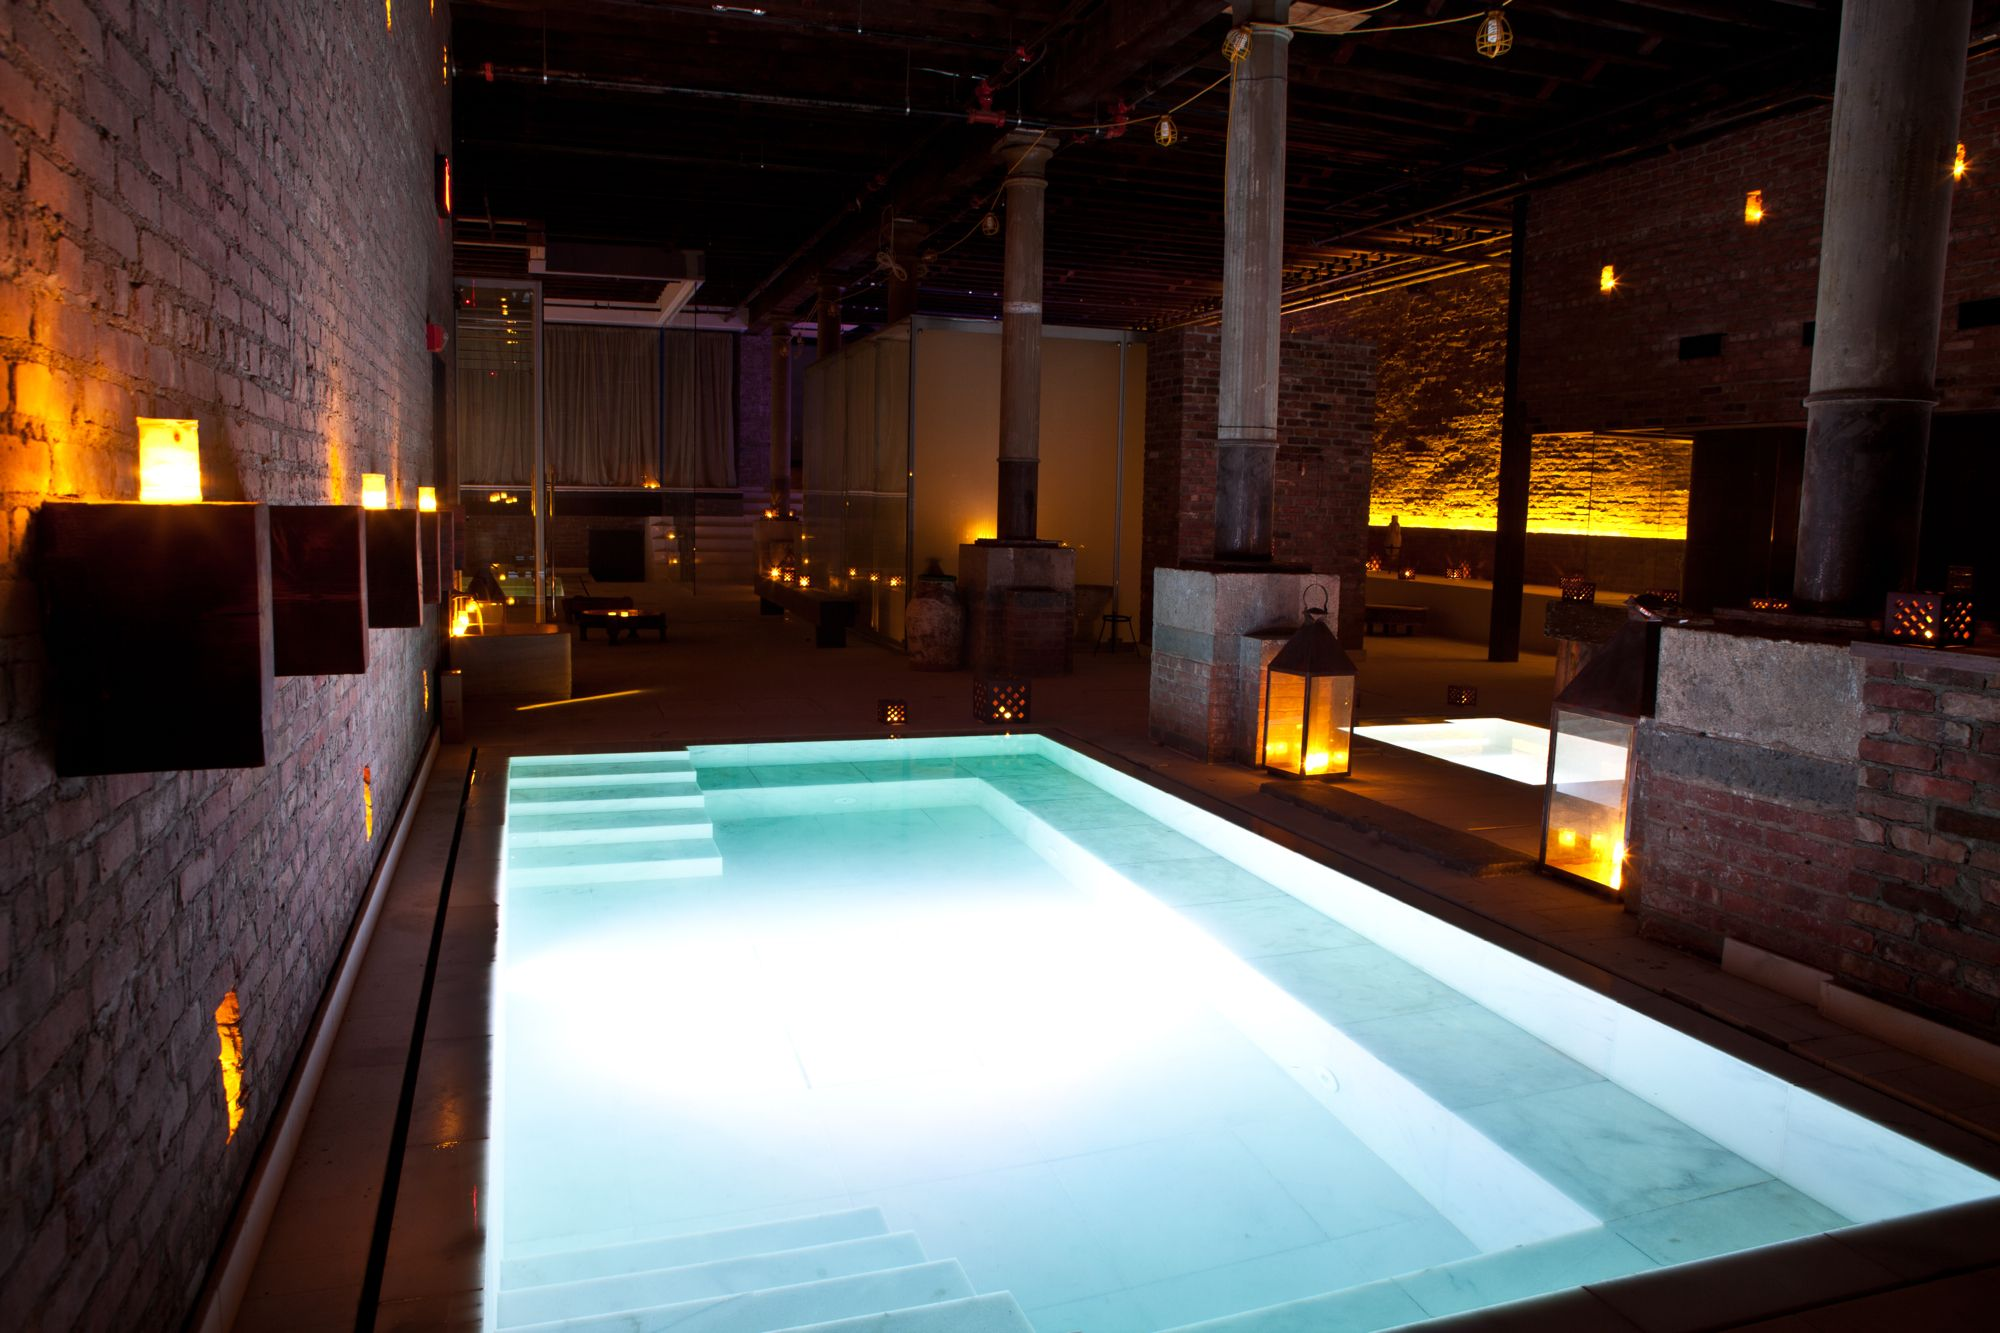 Underground Roman Baths in NYC Japanese bath house